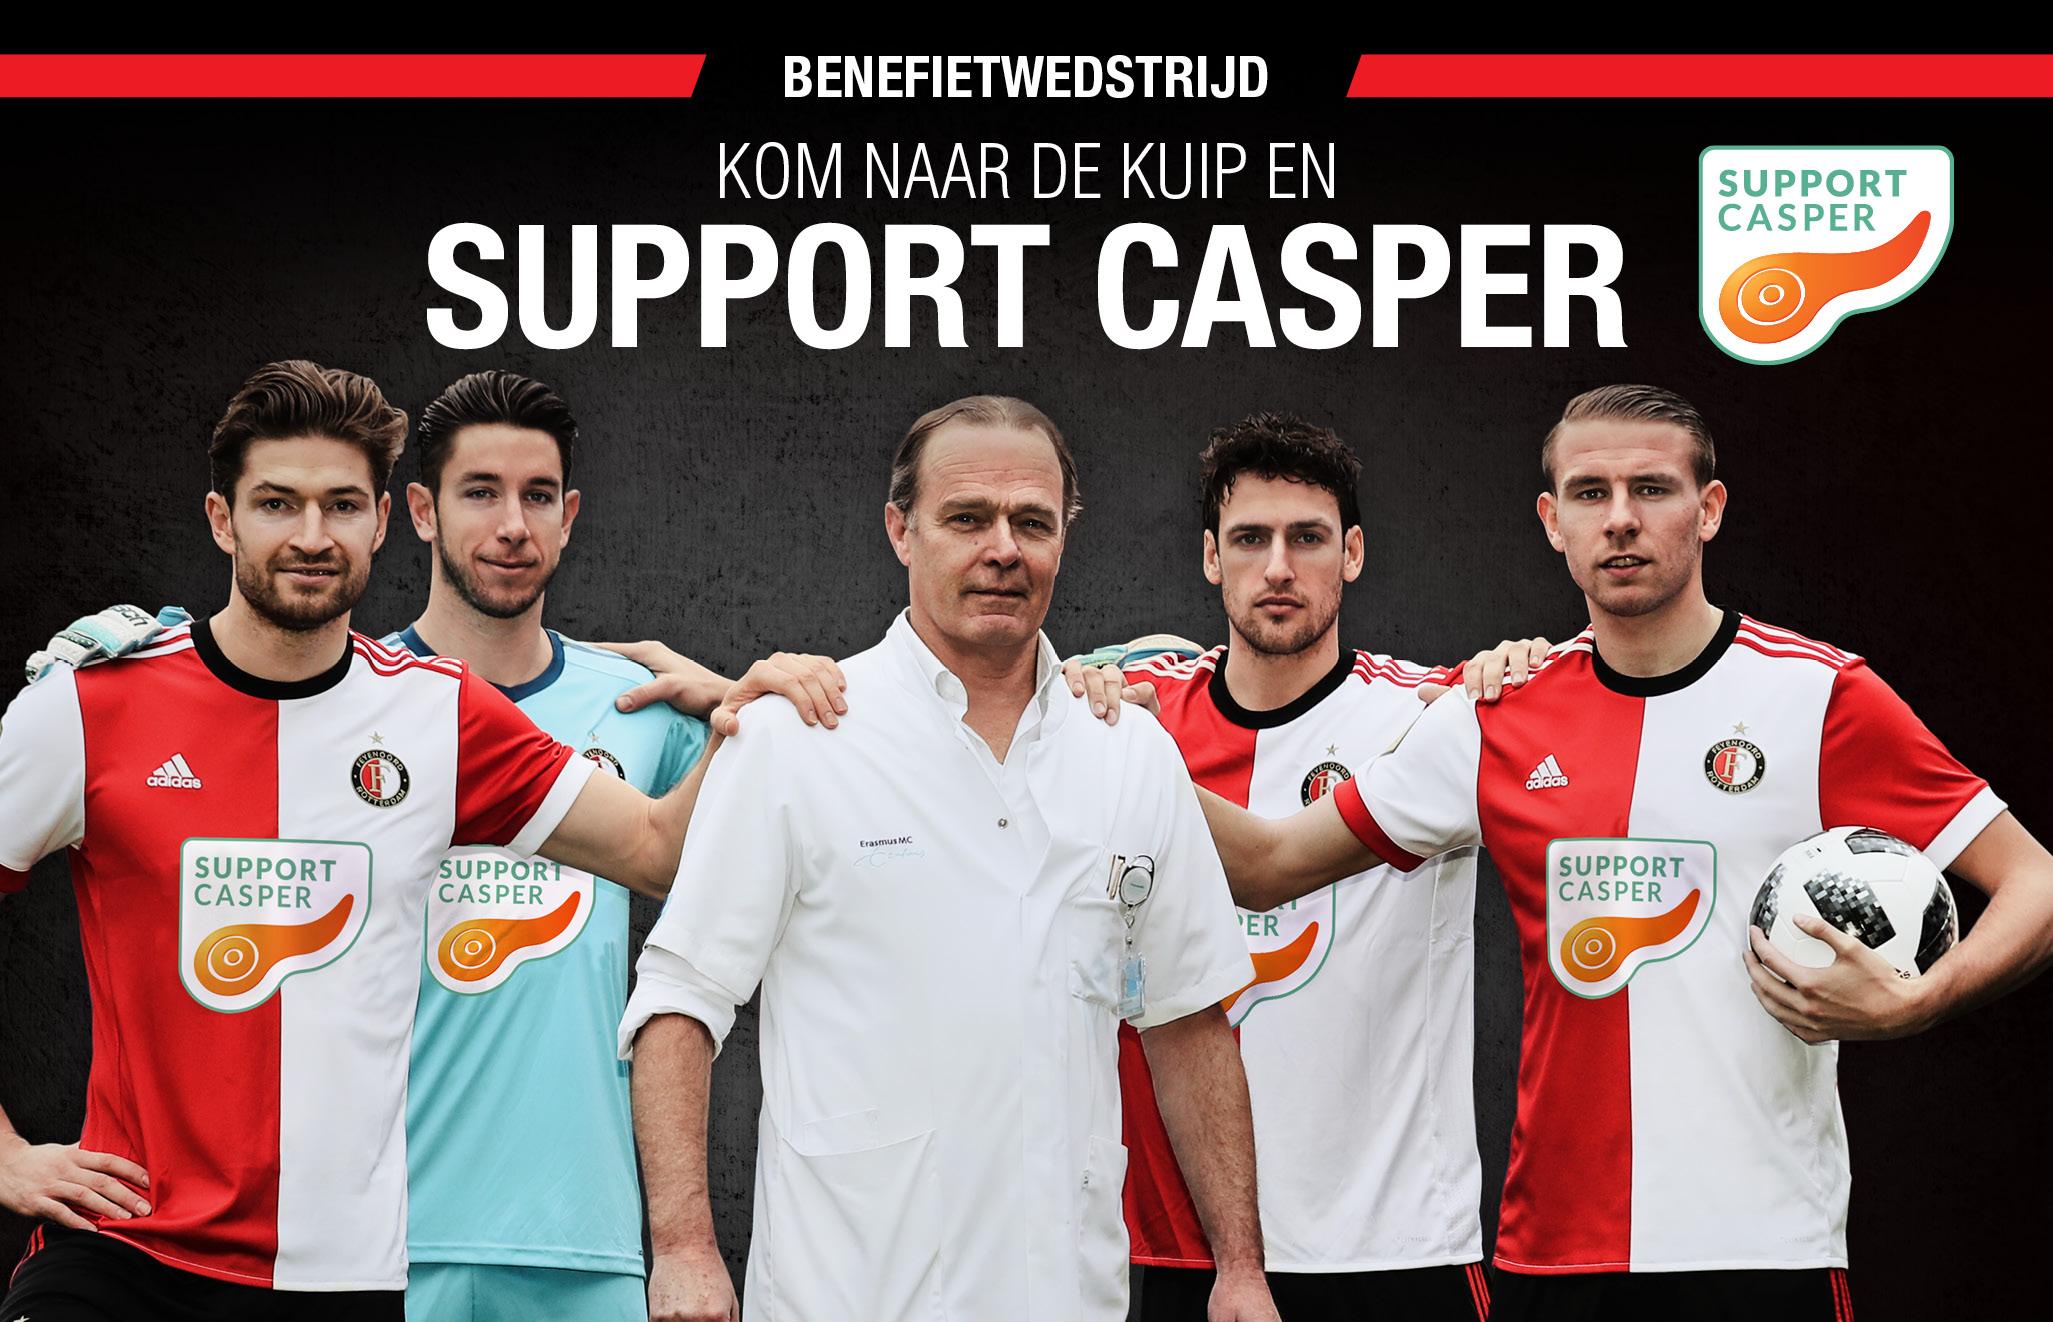 Support%20Casper%20Benefiet